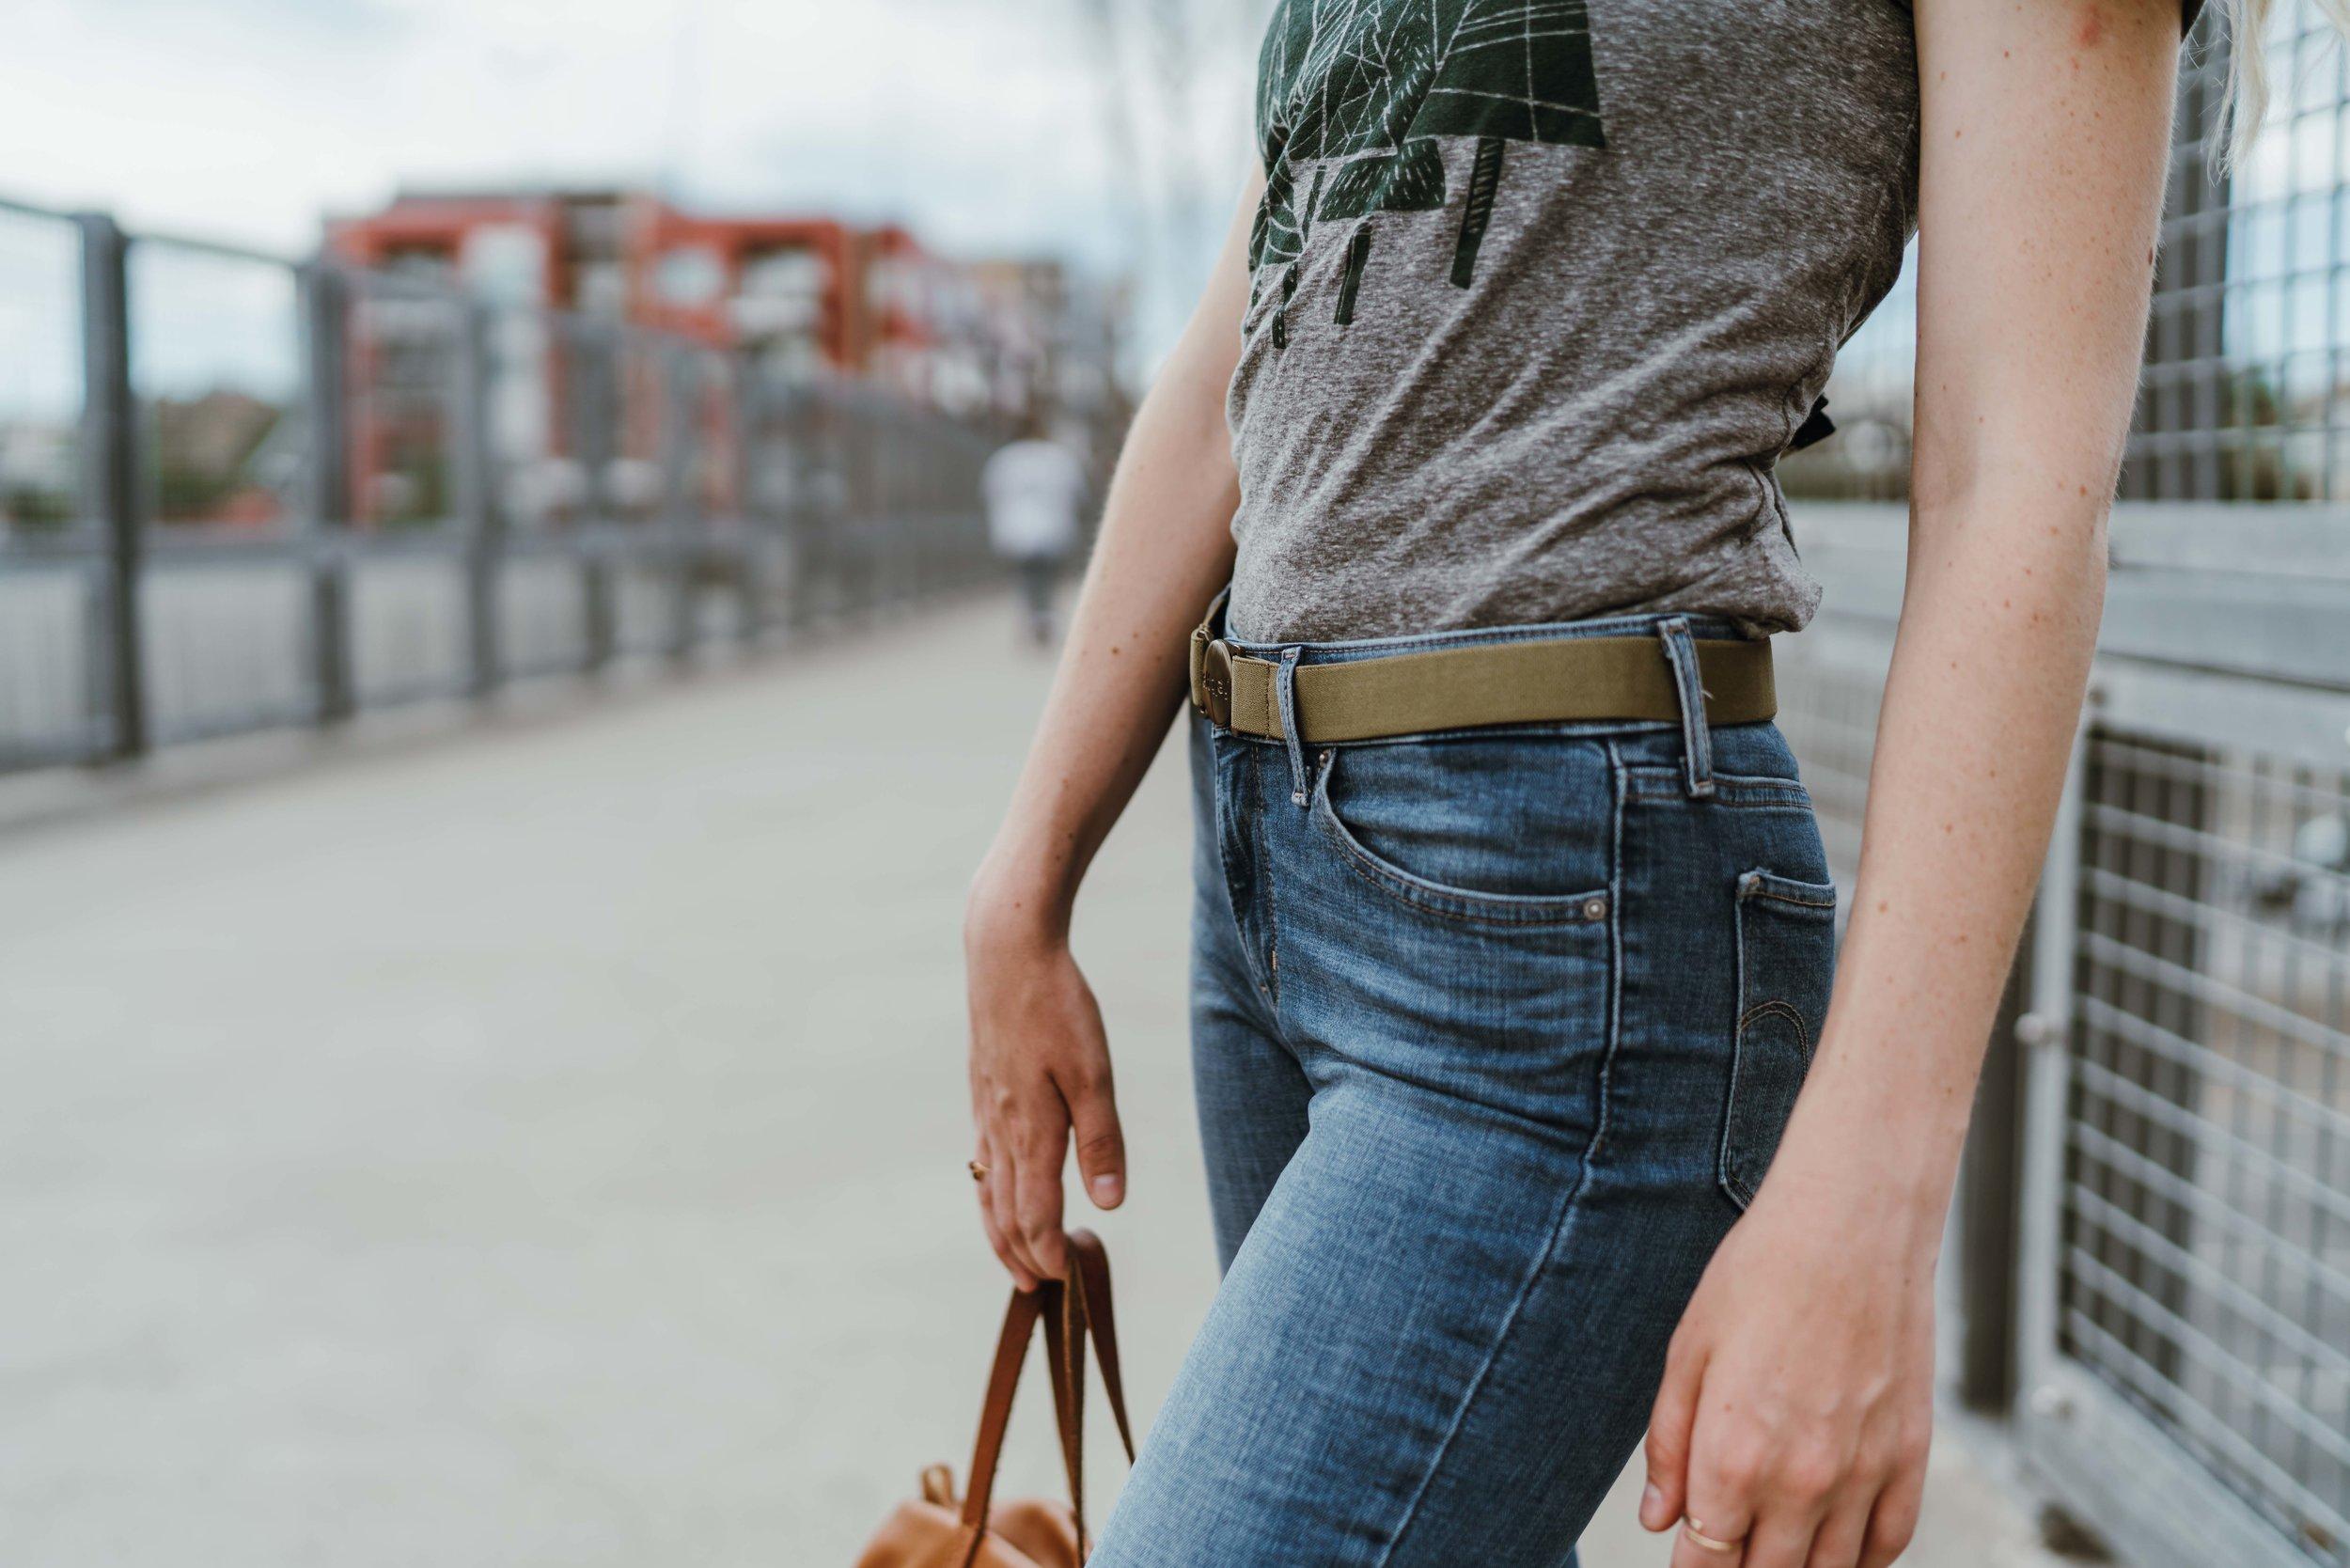 denver photographer commercial lifestyle shoot with Jelt Belt outdoor brand - DSC01907.jpg